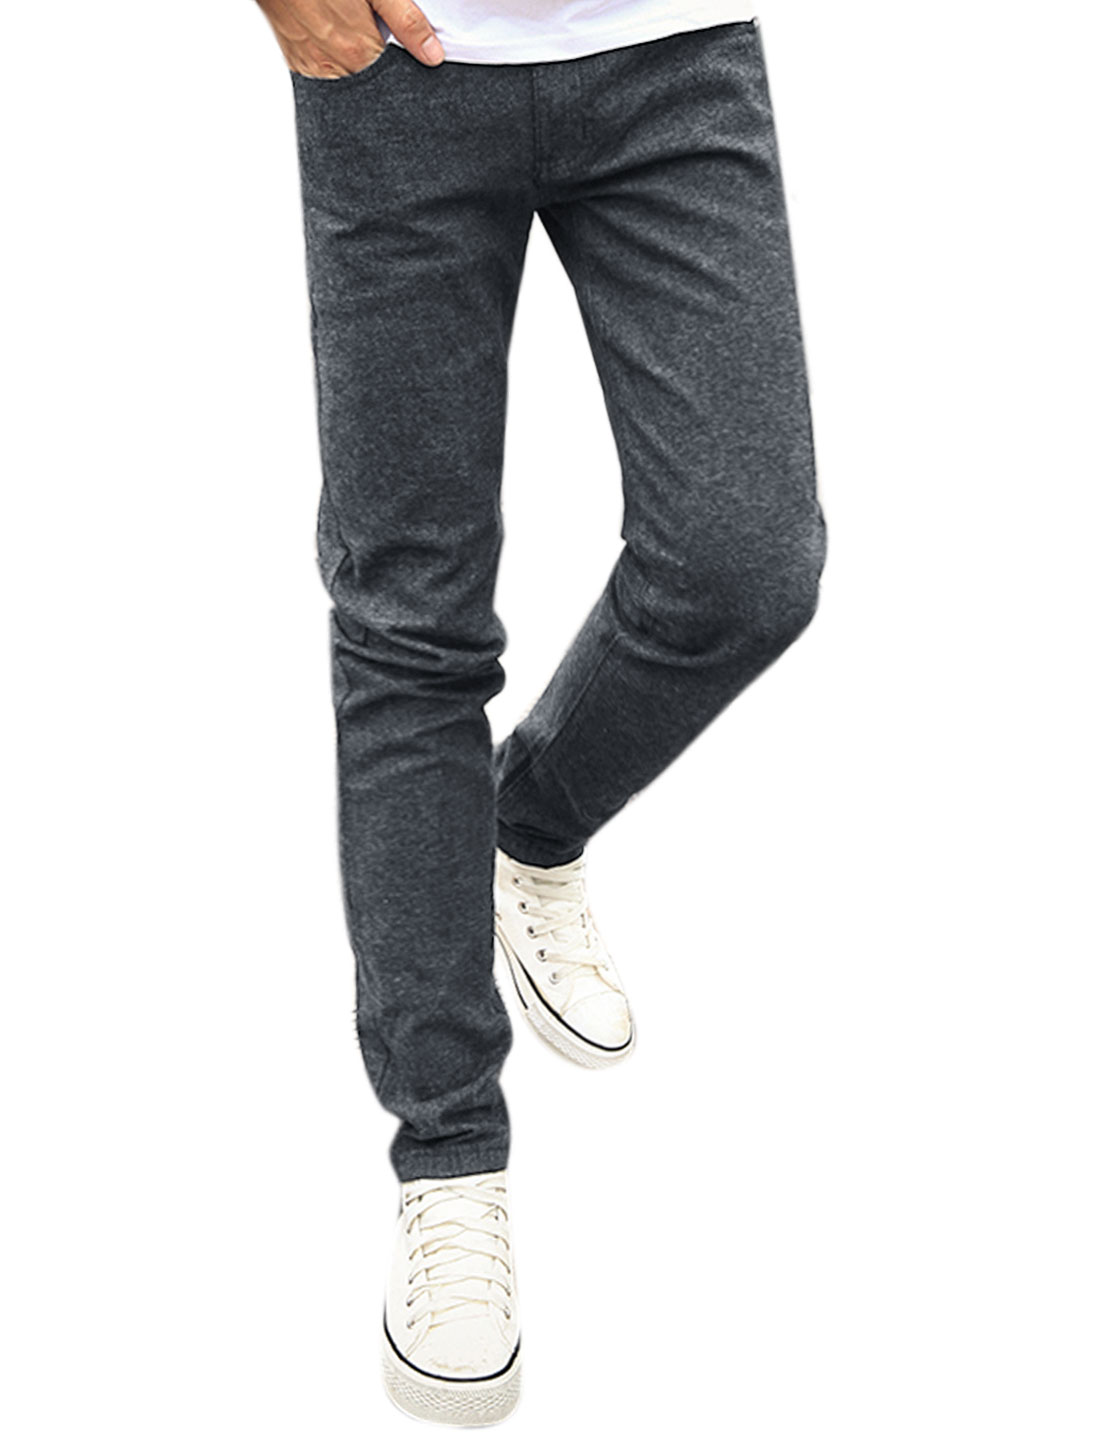 Men Mid Rise Zip Fly Slim Fit Trousers w Pockets Black W32